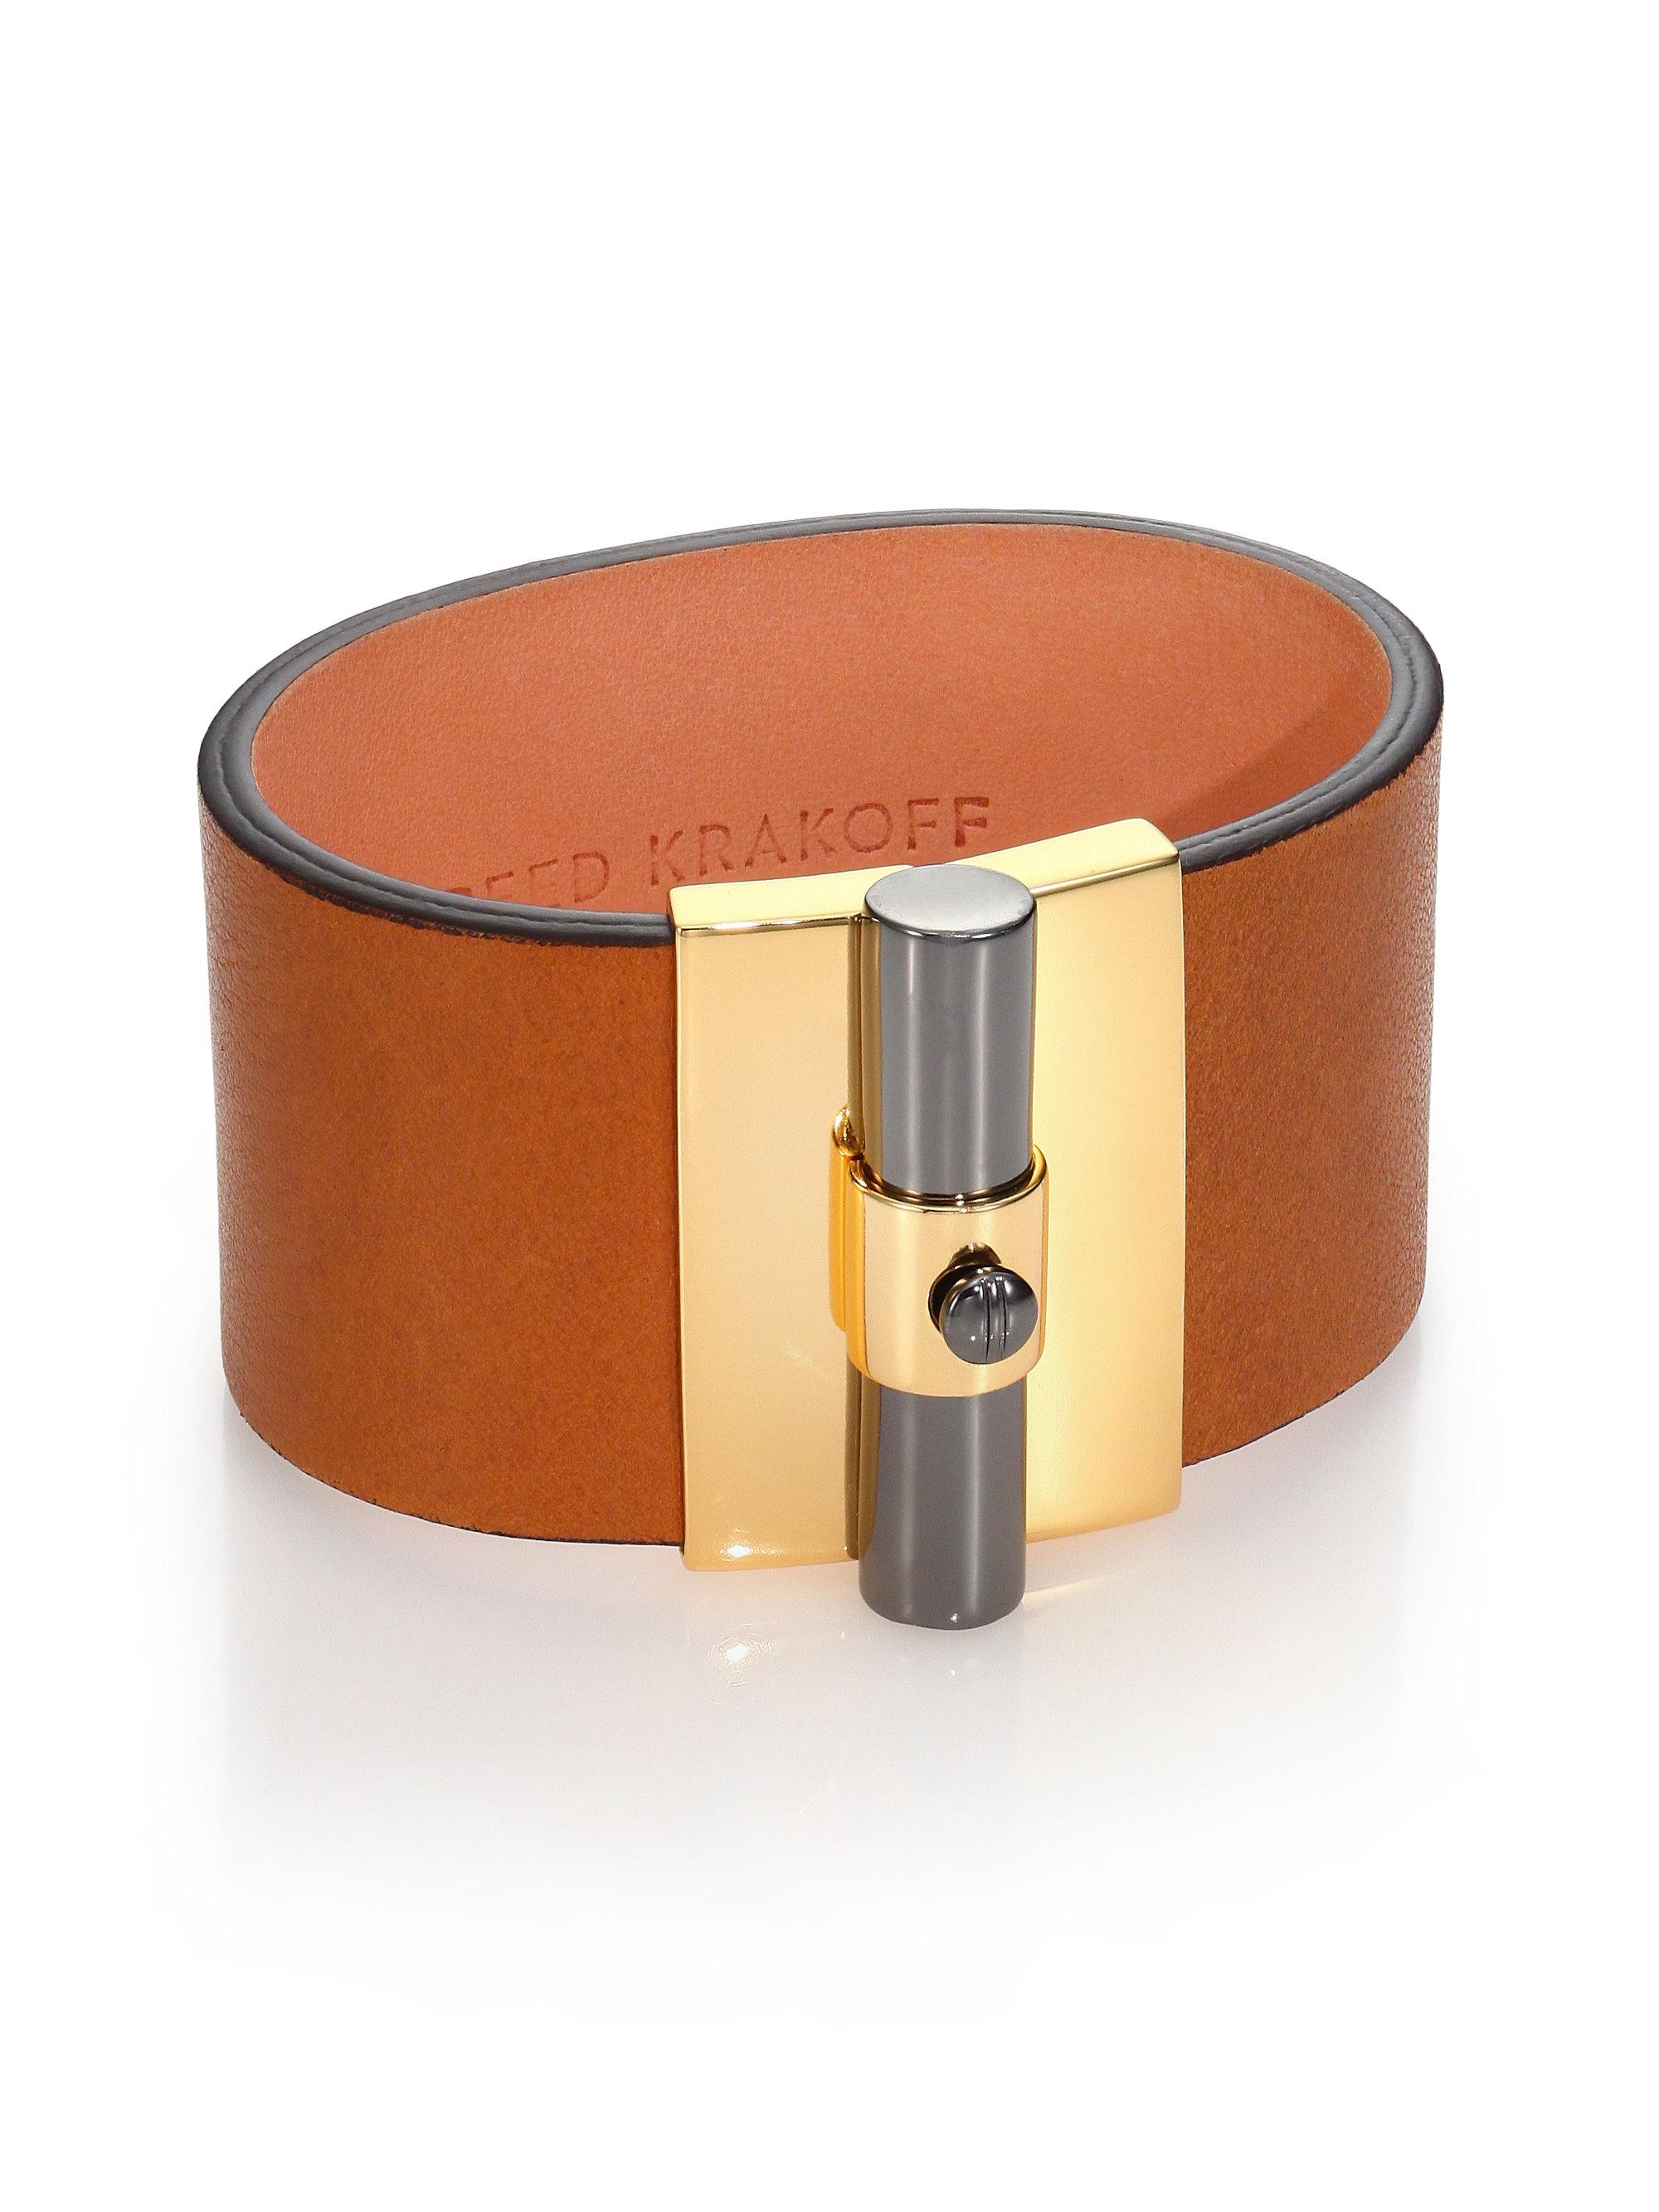 Reed krakoff T-Bar Leather Cuff Bracelet in Metallic